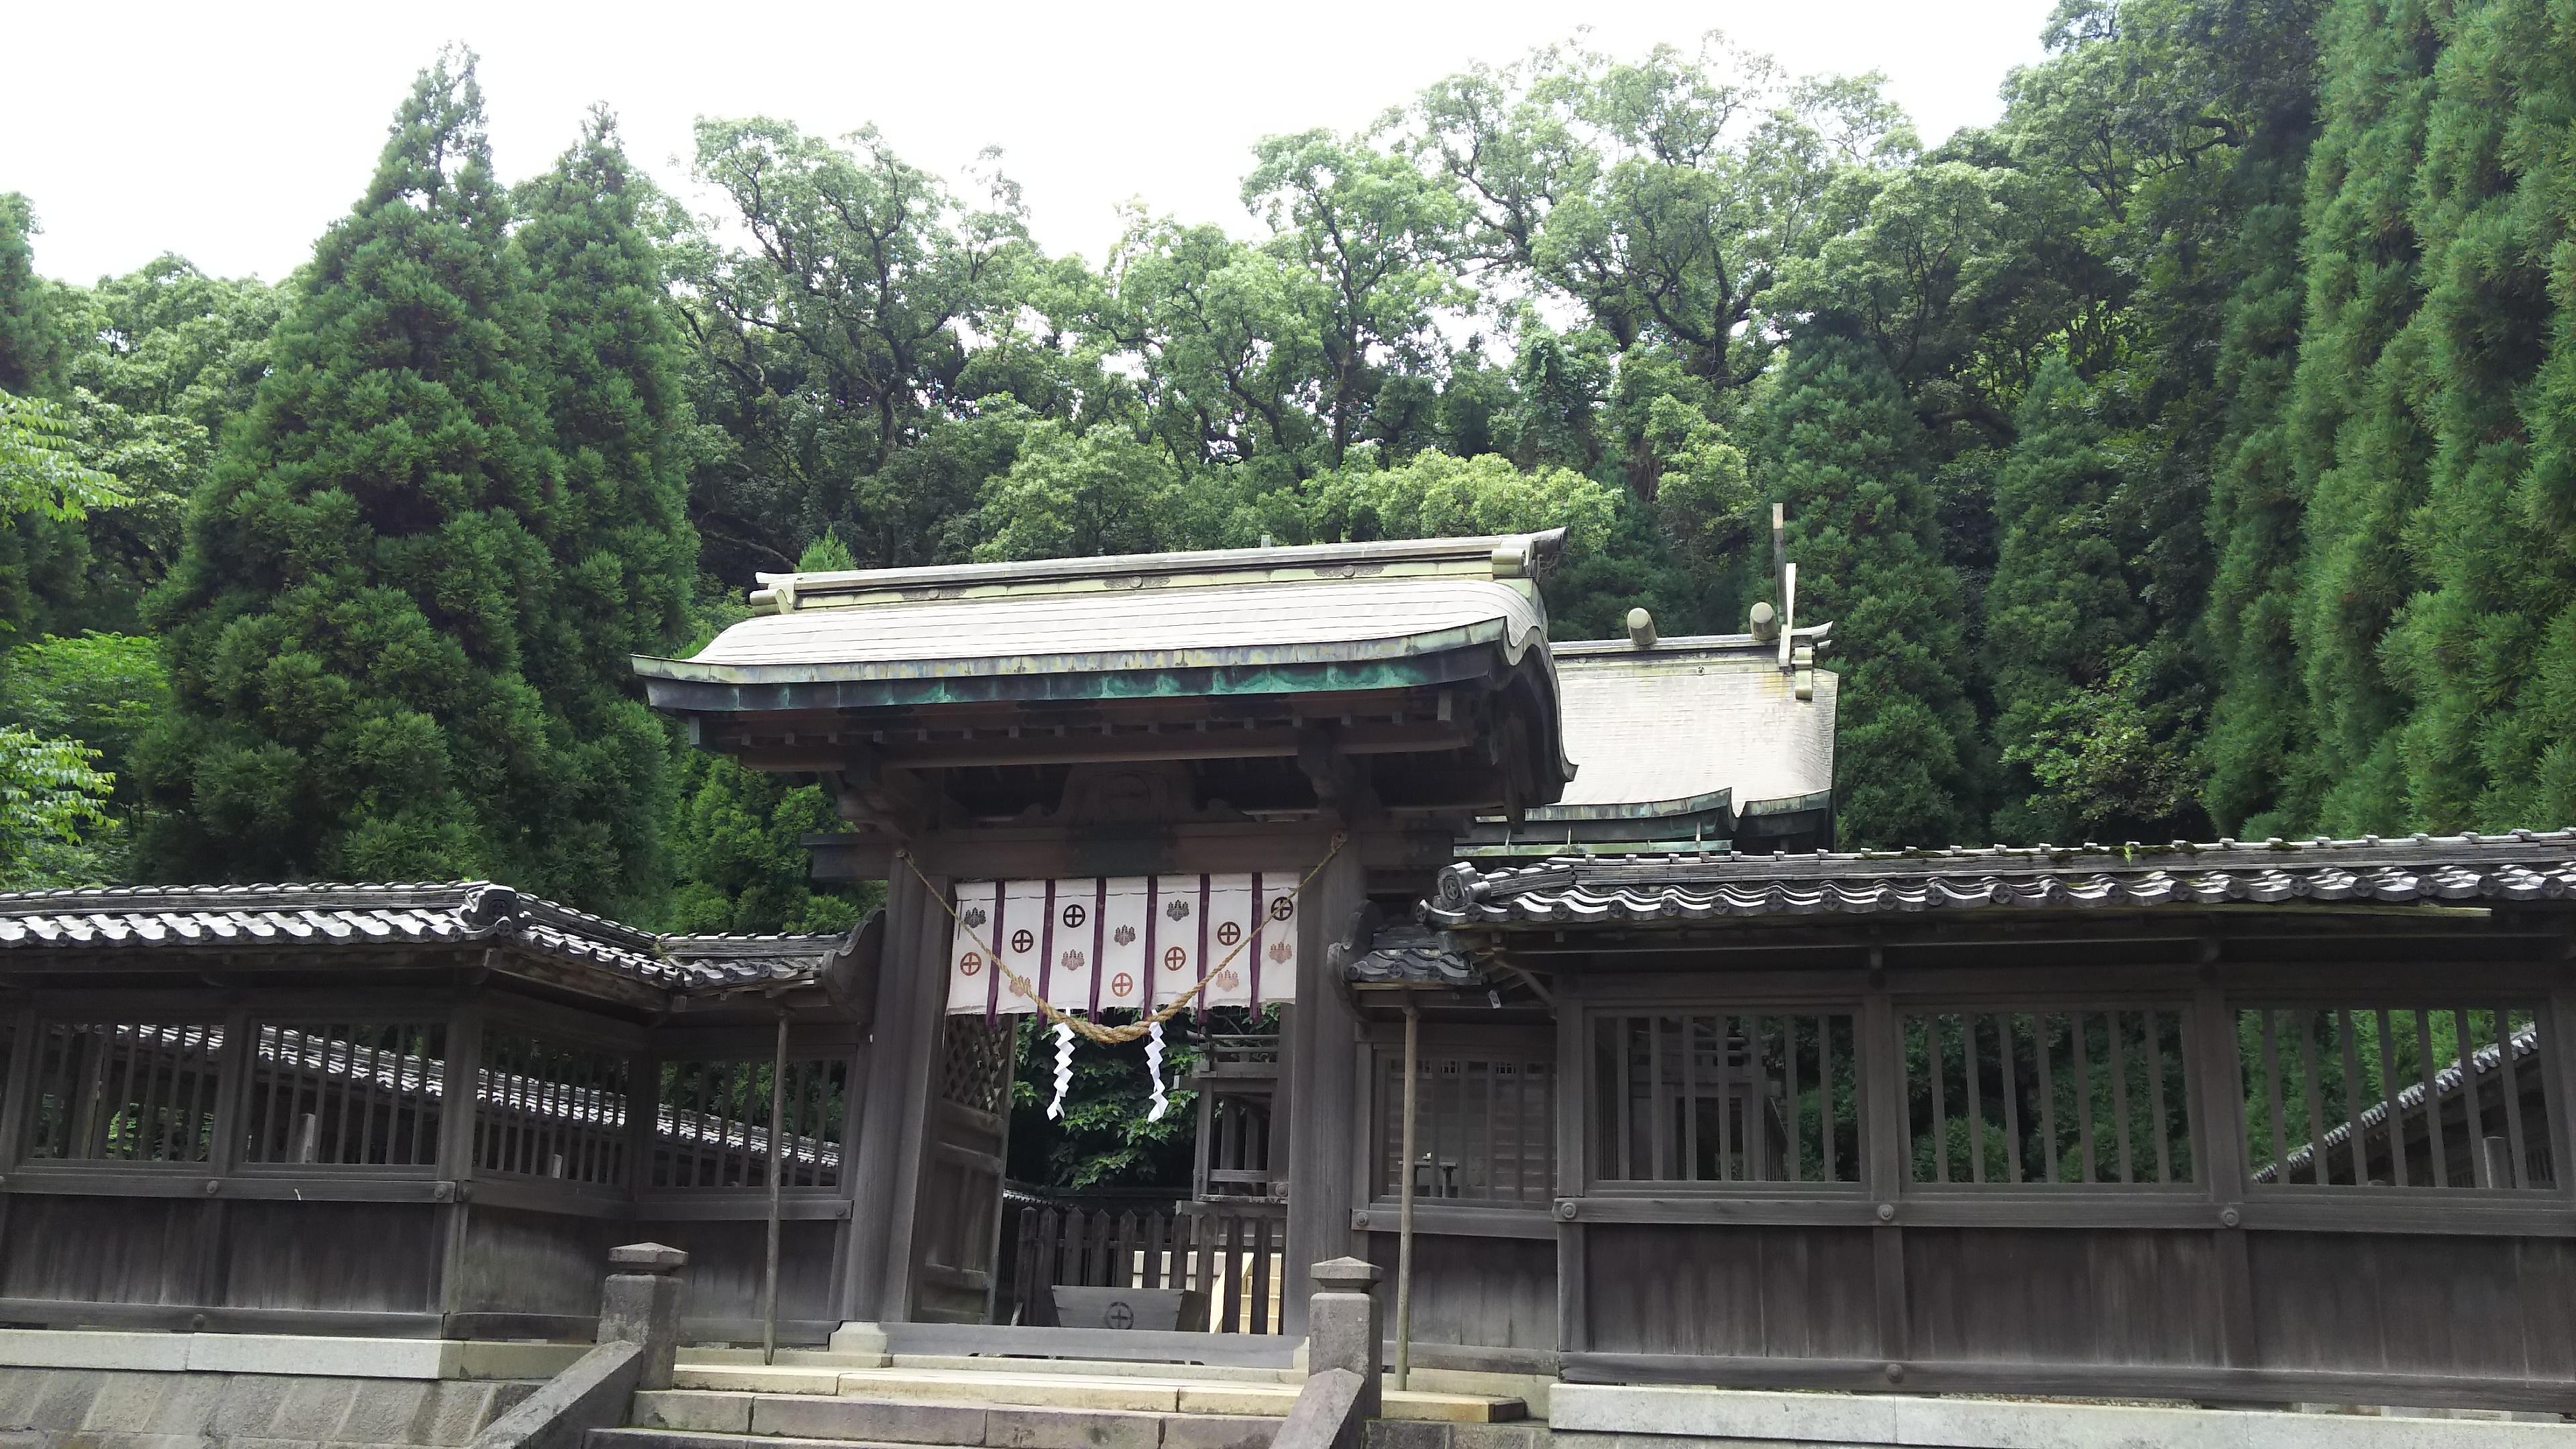 鶴嶺神社の山門